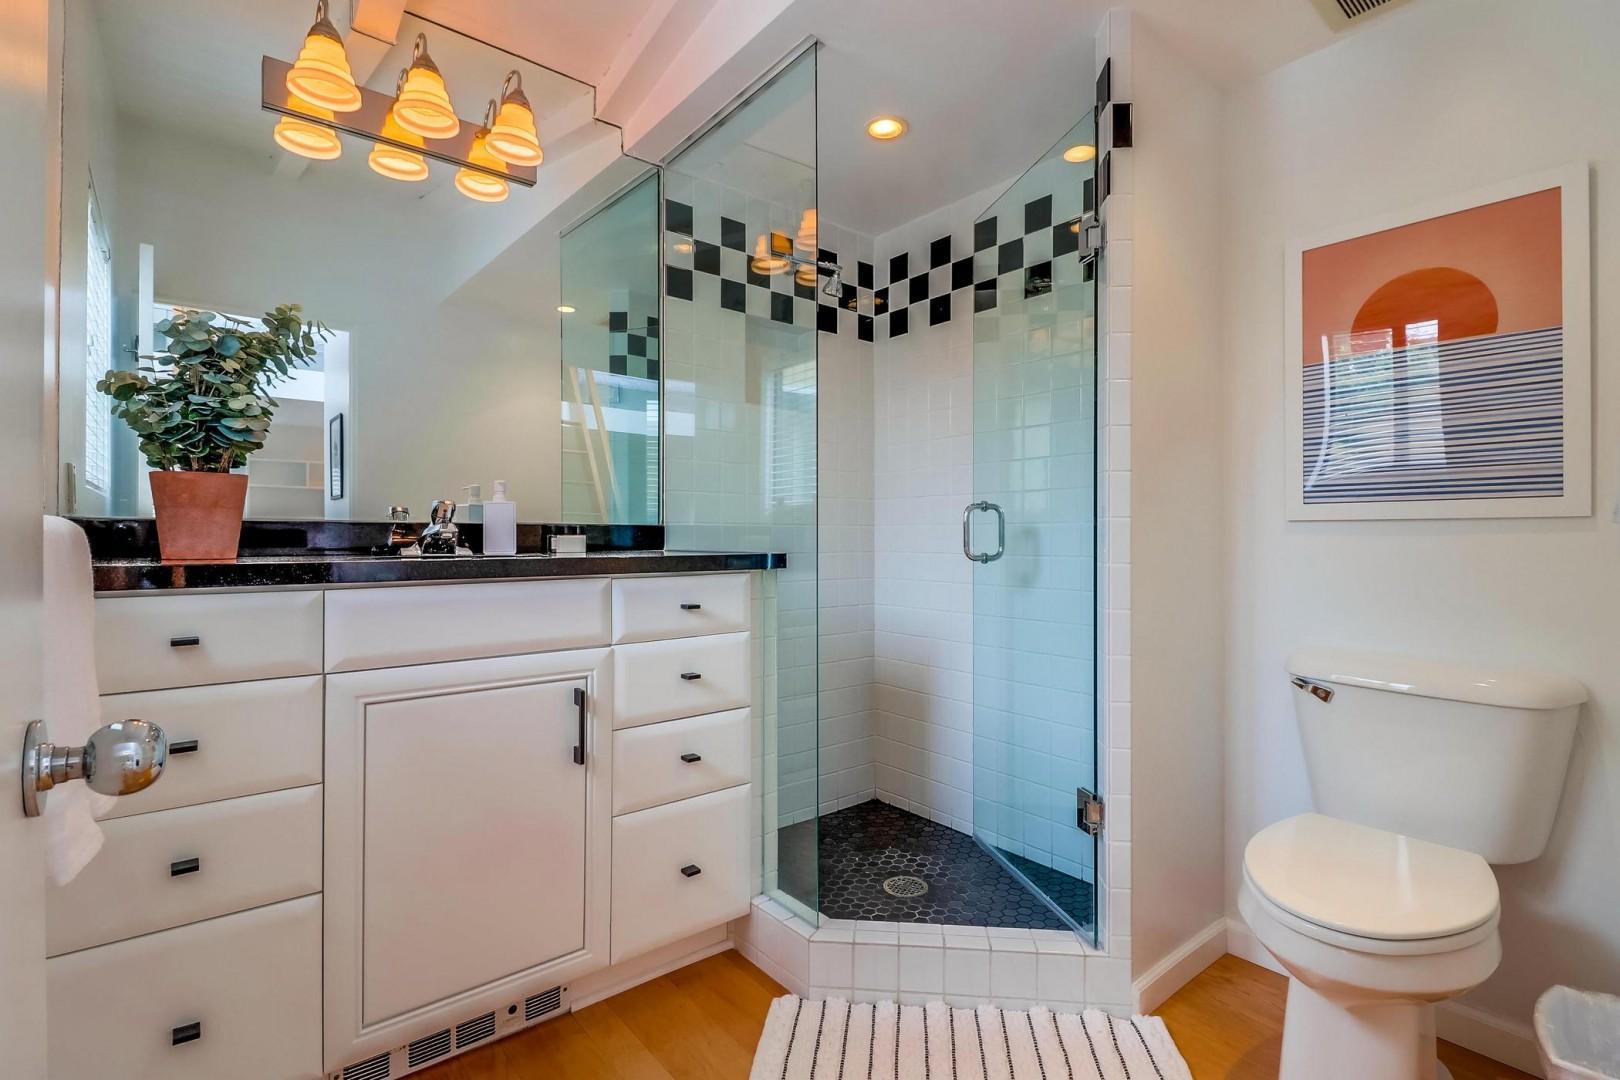 Casita bathroom with shower